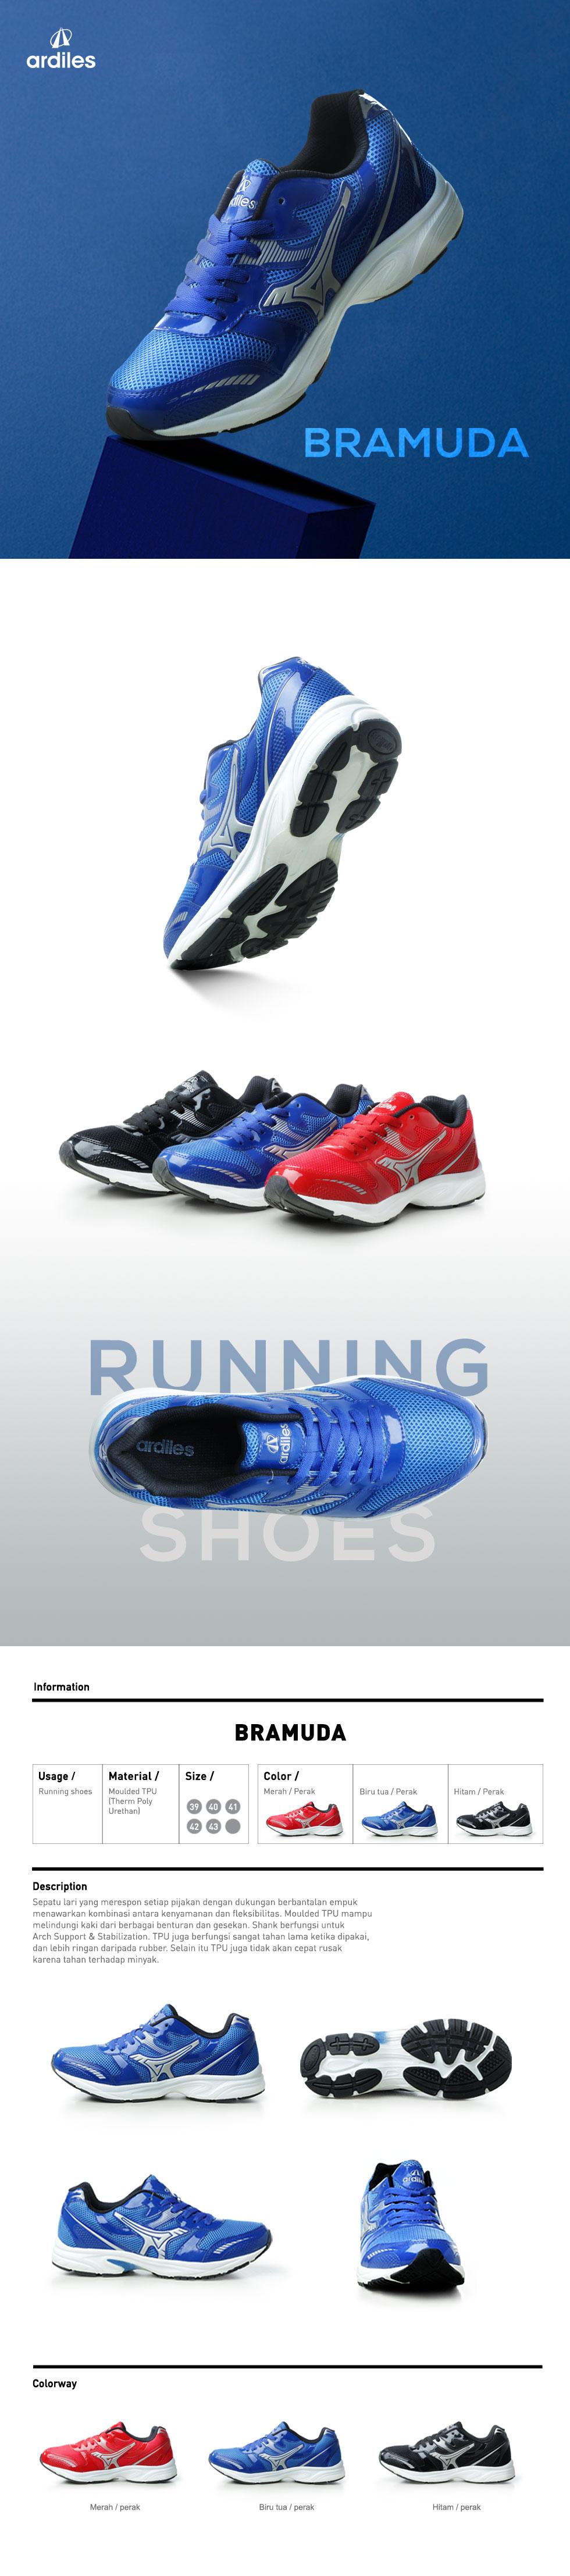 Buy Clearance Sale Ardiles Shoes Men Women And Kids Sepatu Estelle Running Hitam 39 Opsi